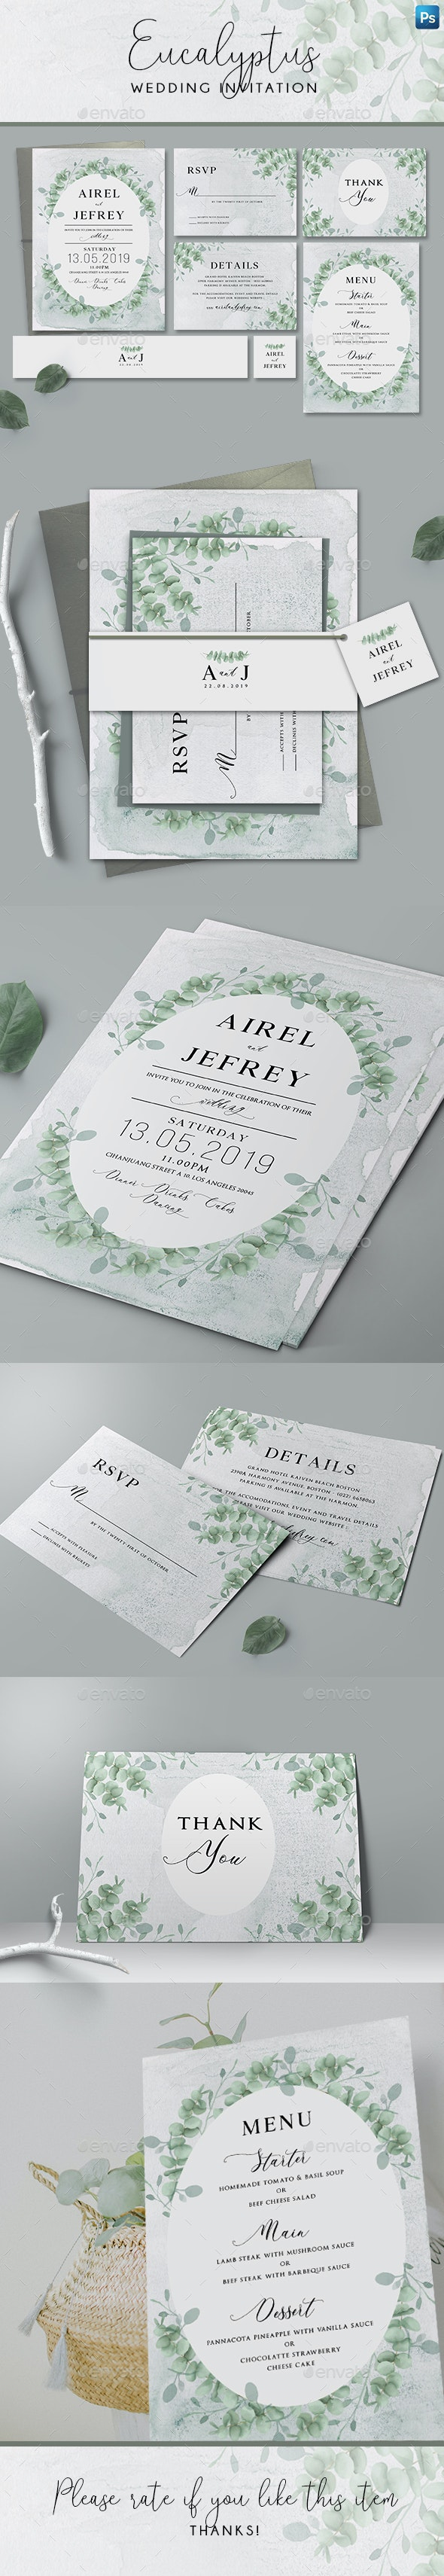 Eucalyptus Wedding Invitation - Wedding Greeting Cards